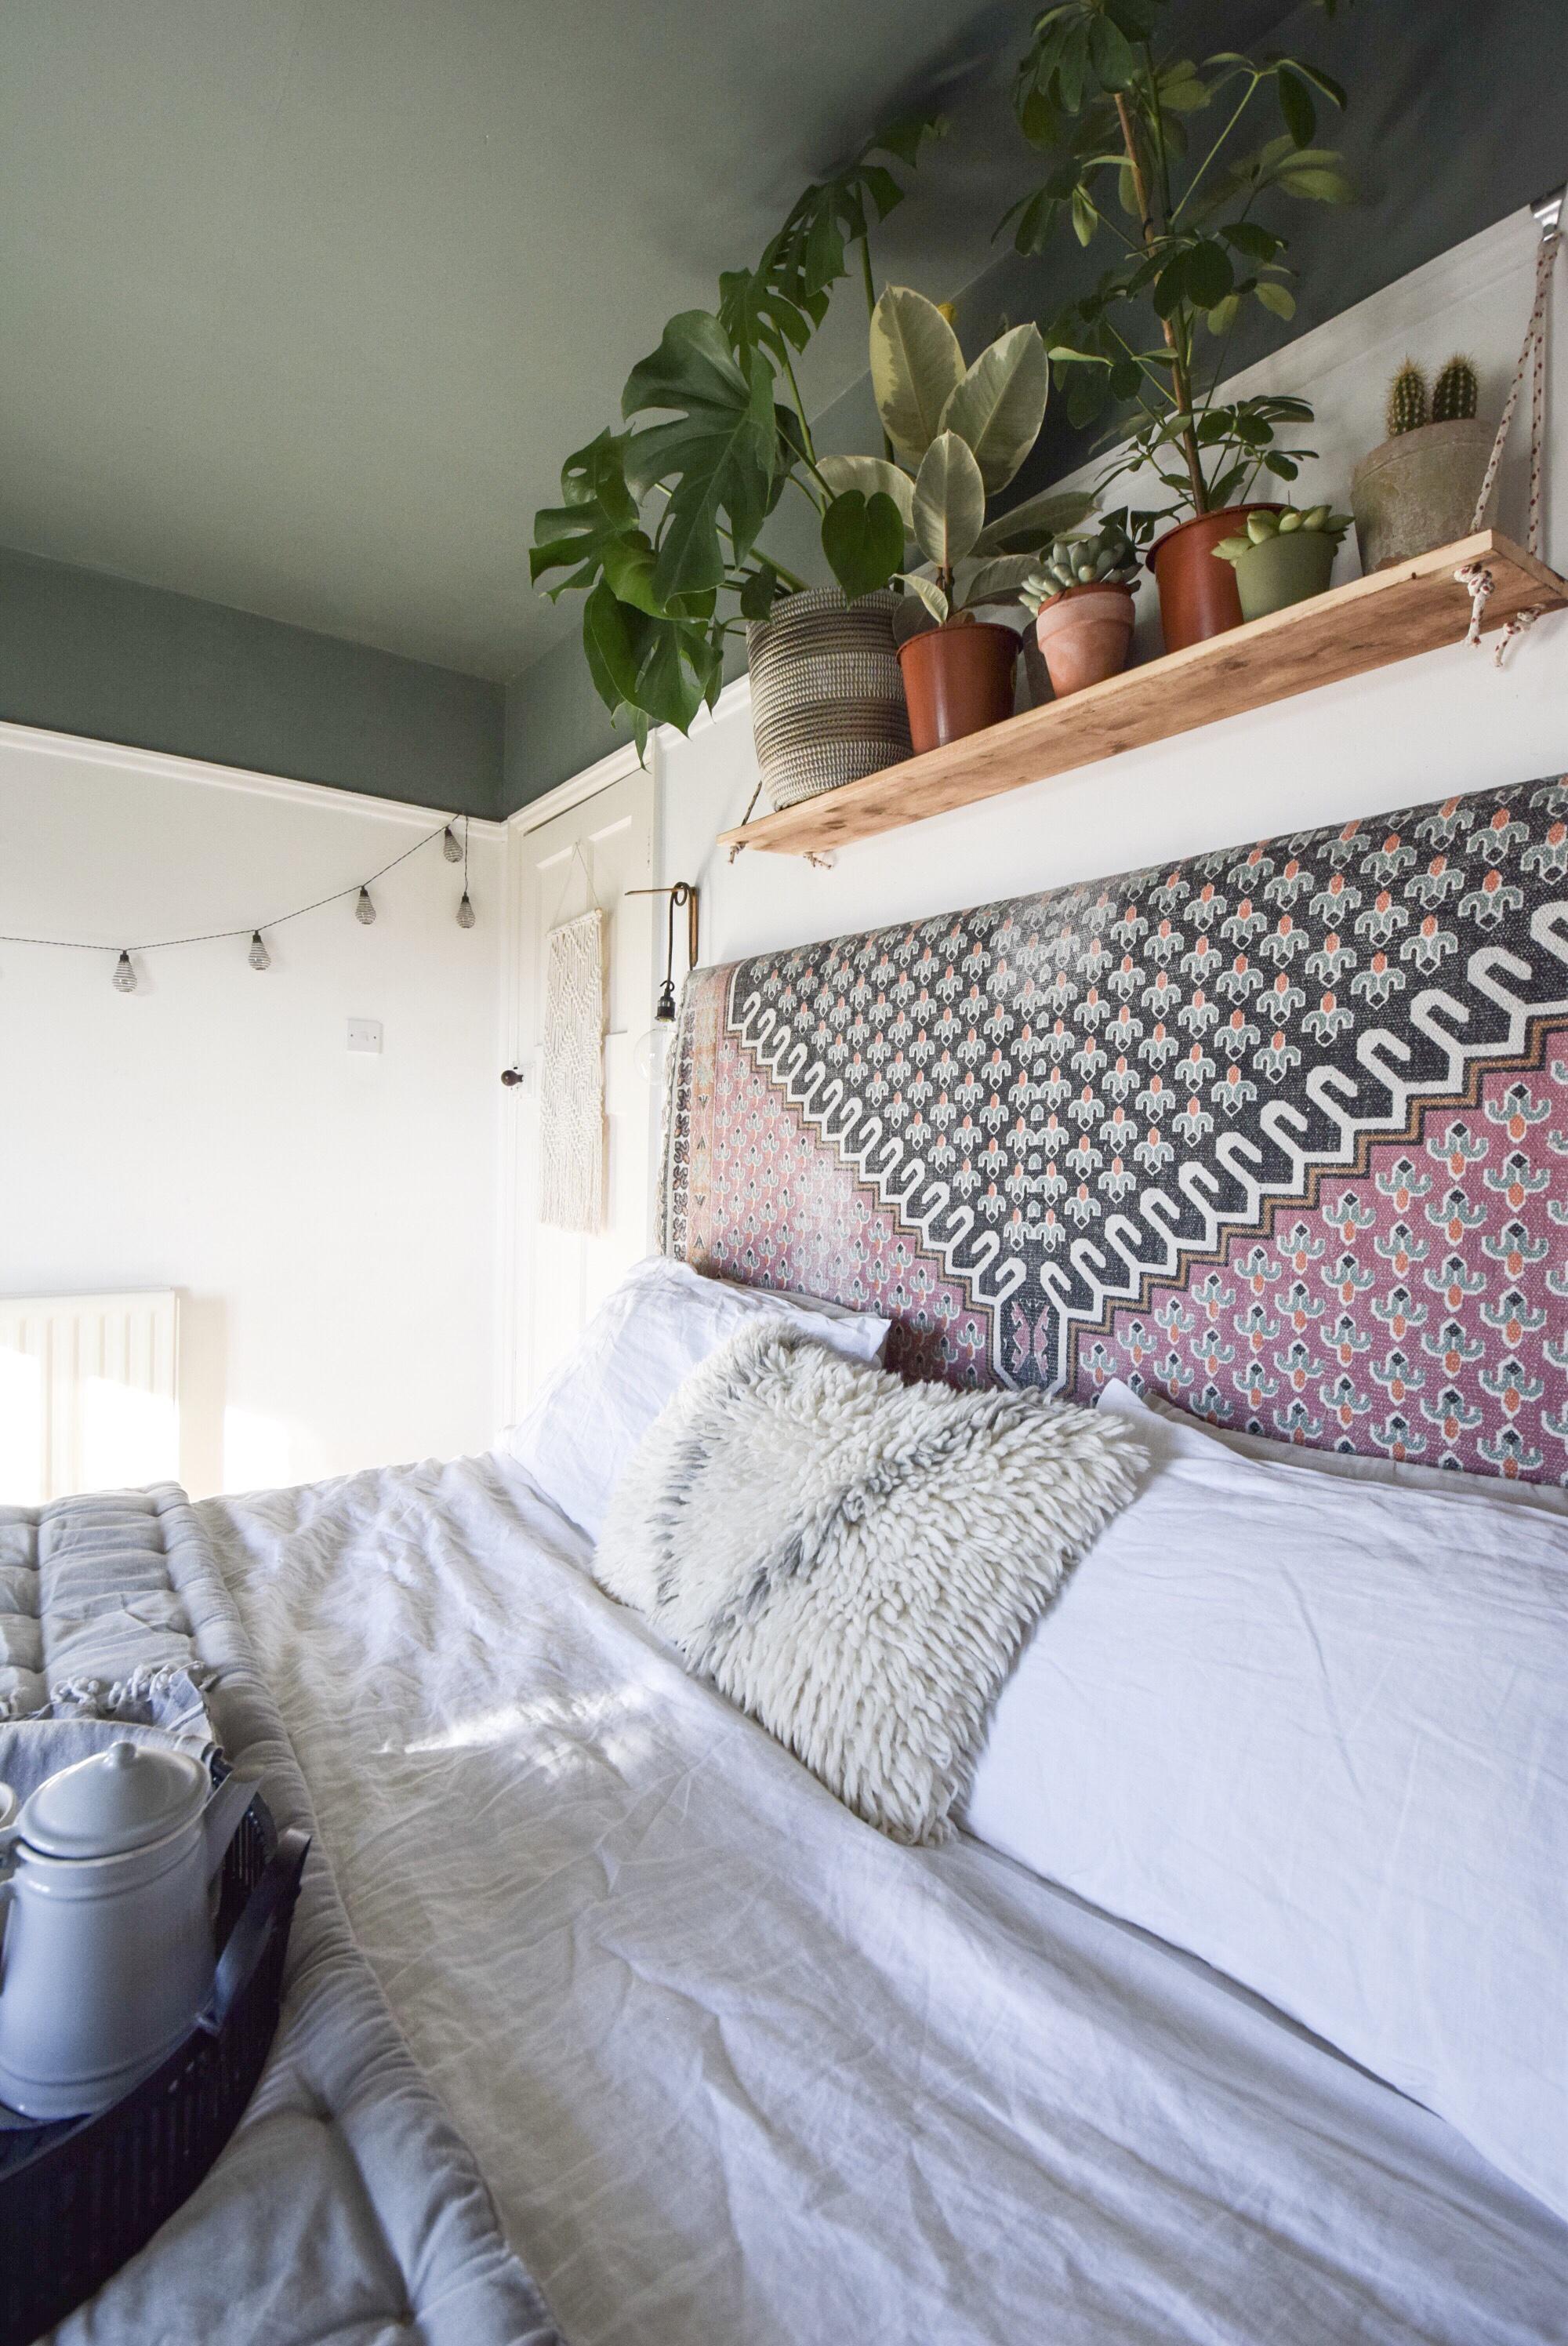 My Bedroom makeover v2 - I am Hayley Stuart